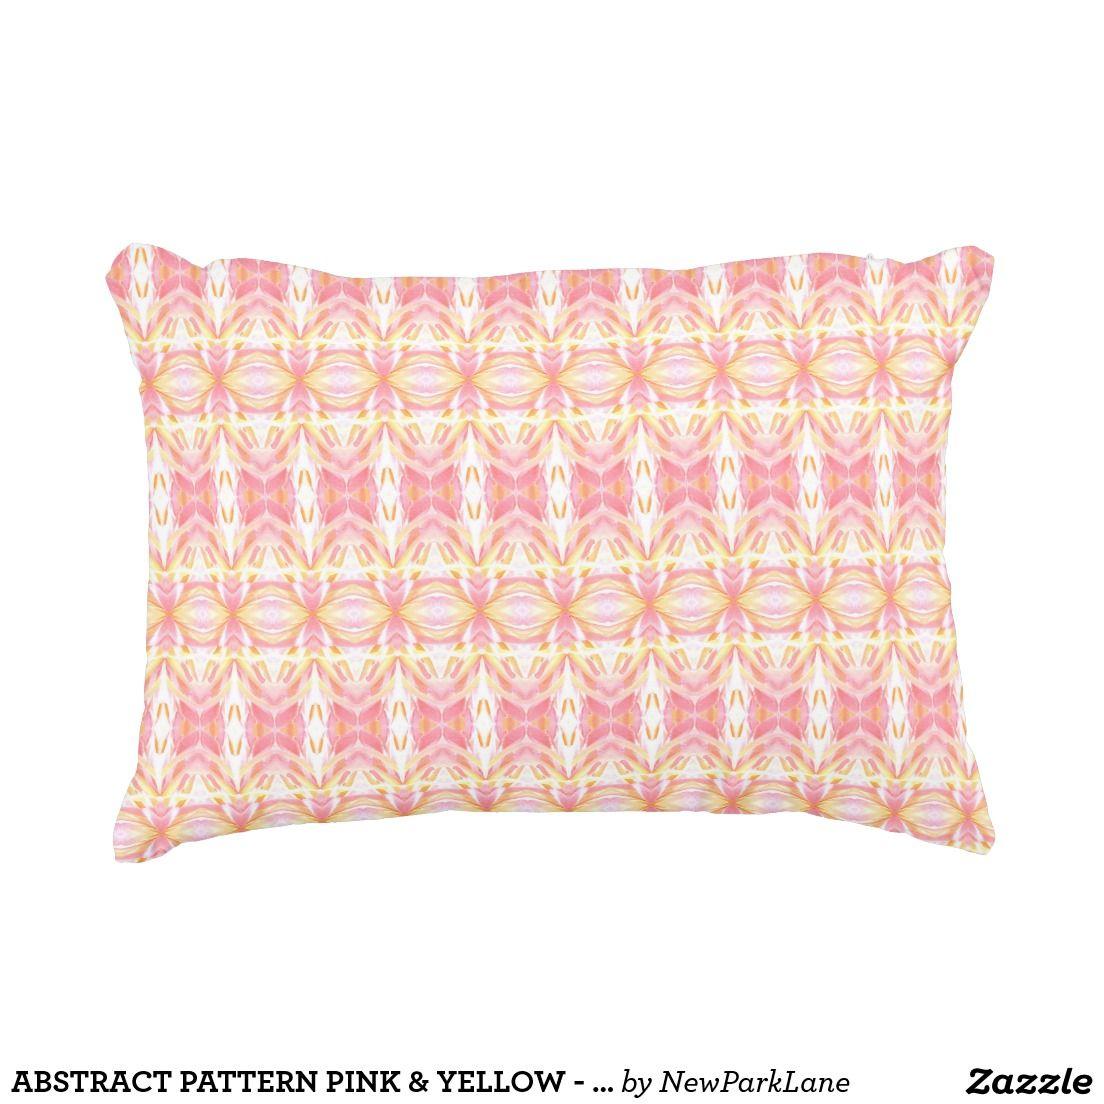 cover pin pillows yellow by pillow accent starburst lumbar decorative